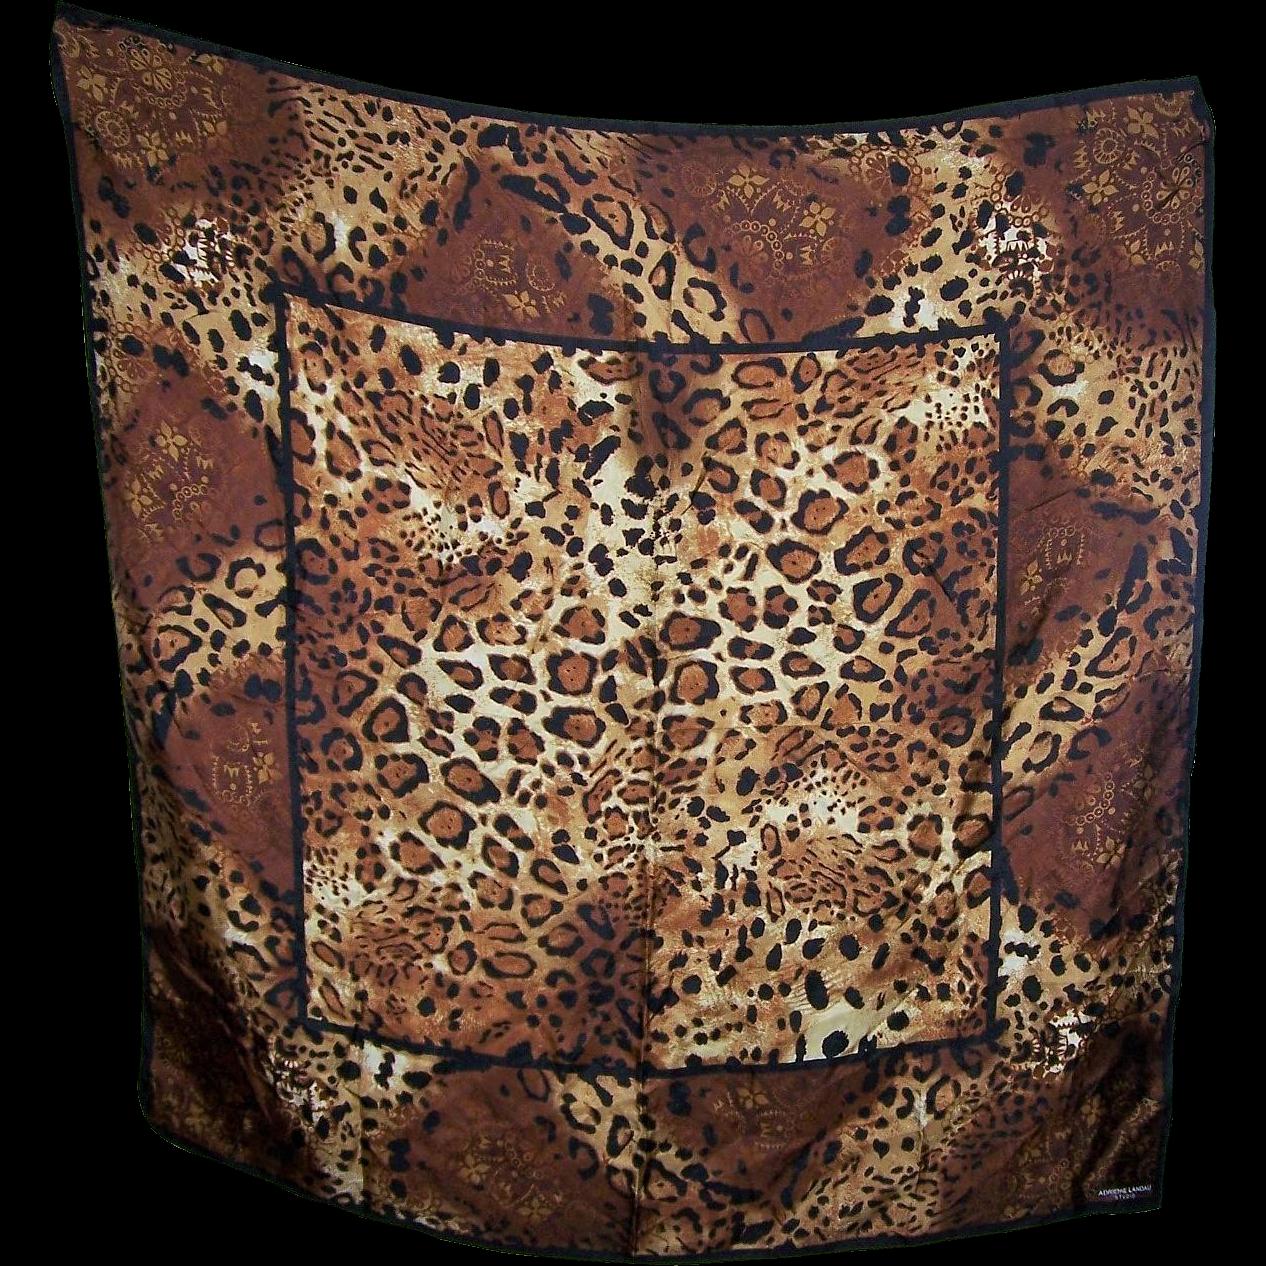 Designer Signed Adrienne Landau Studio Wild Cat Spotted Leopard Print Scarf